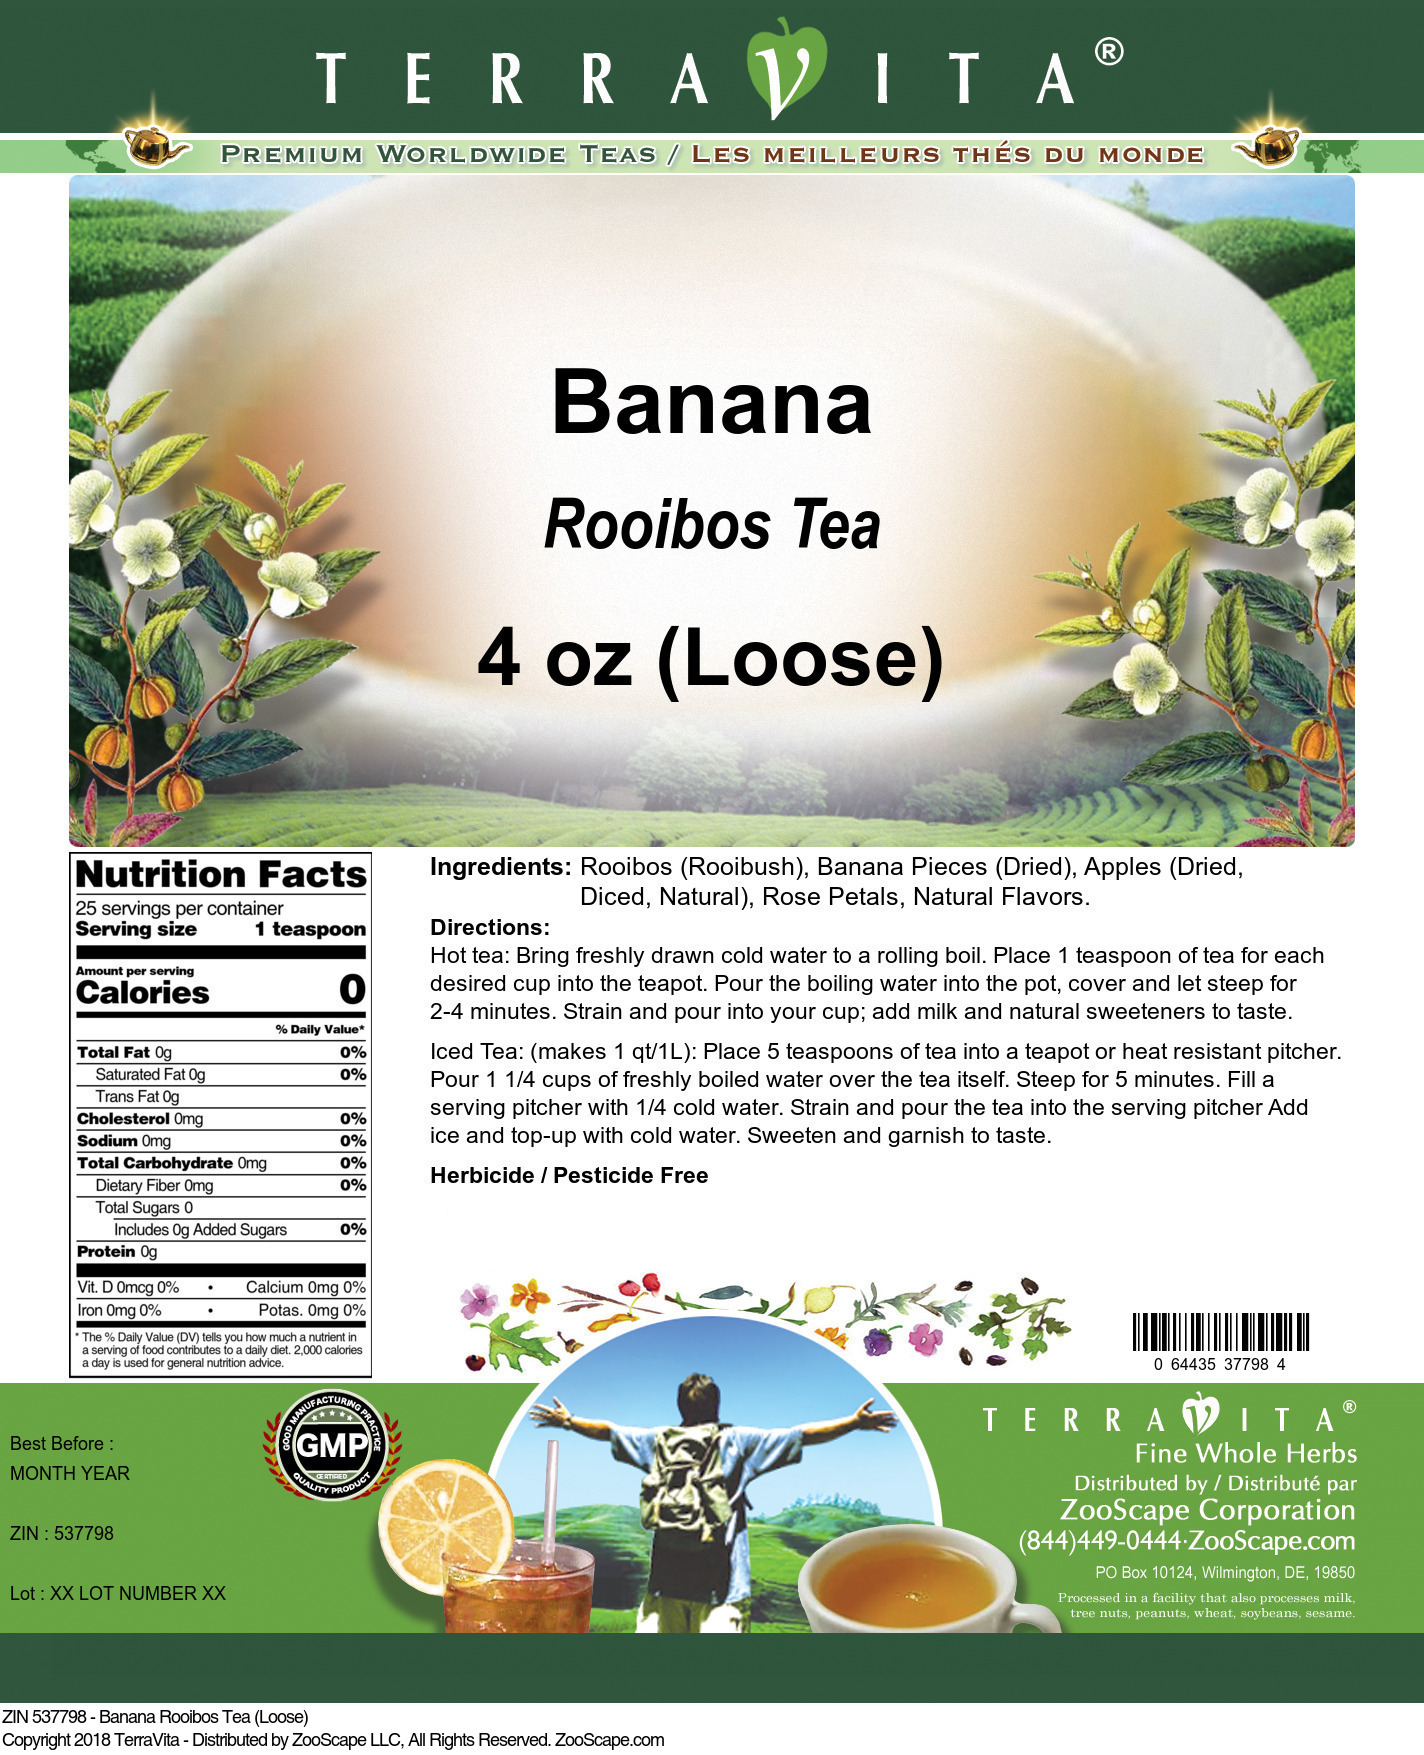 Banana Rooibos Tea (Loose)